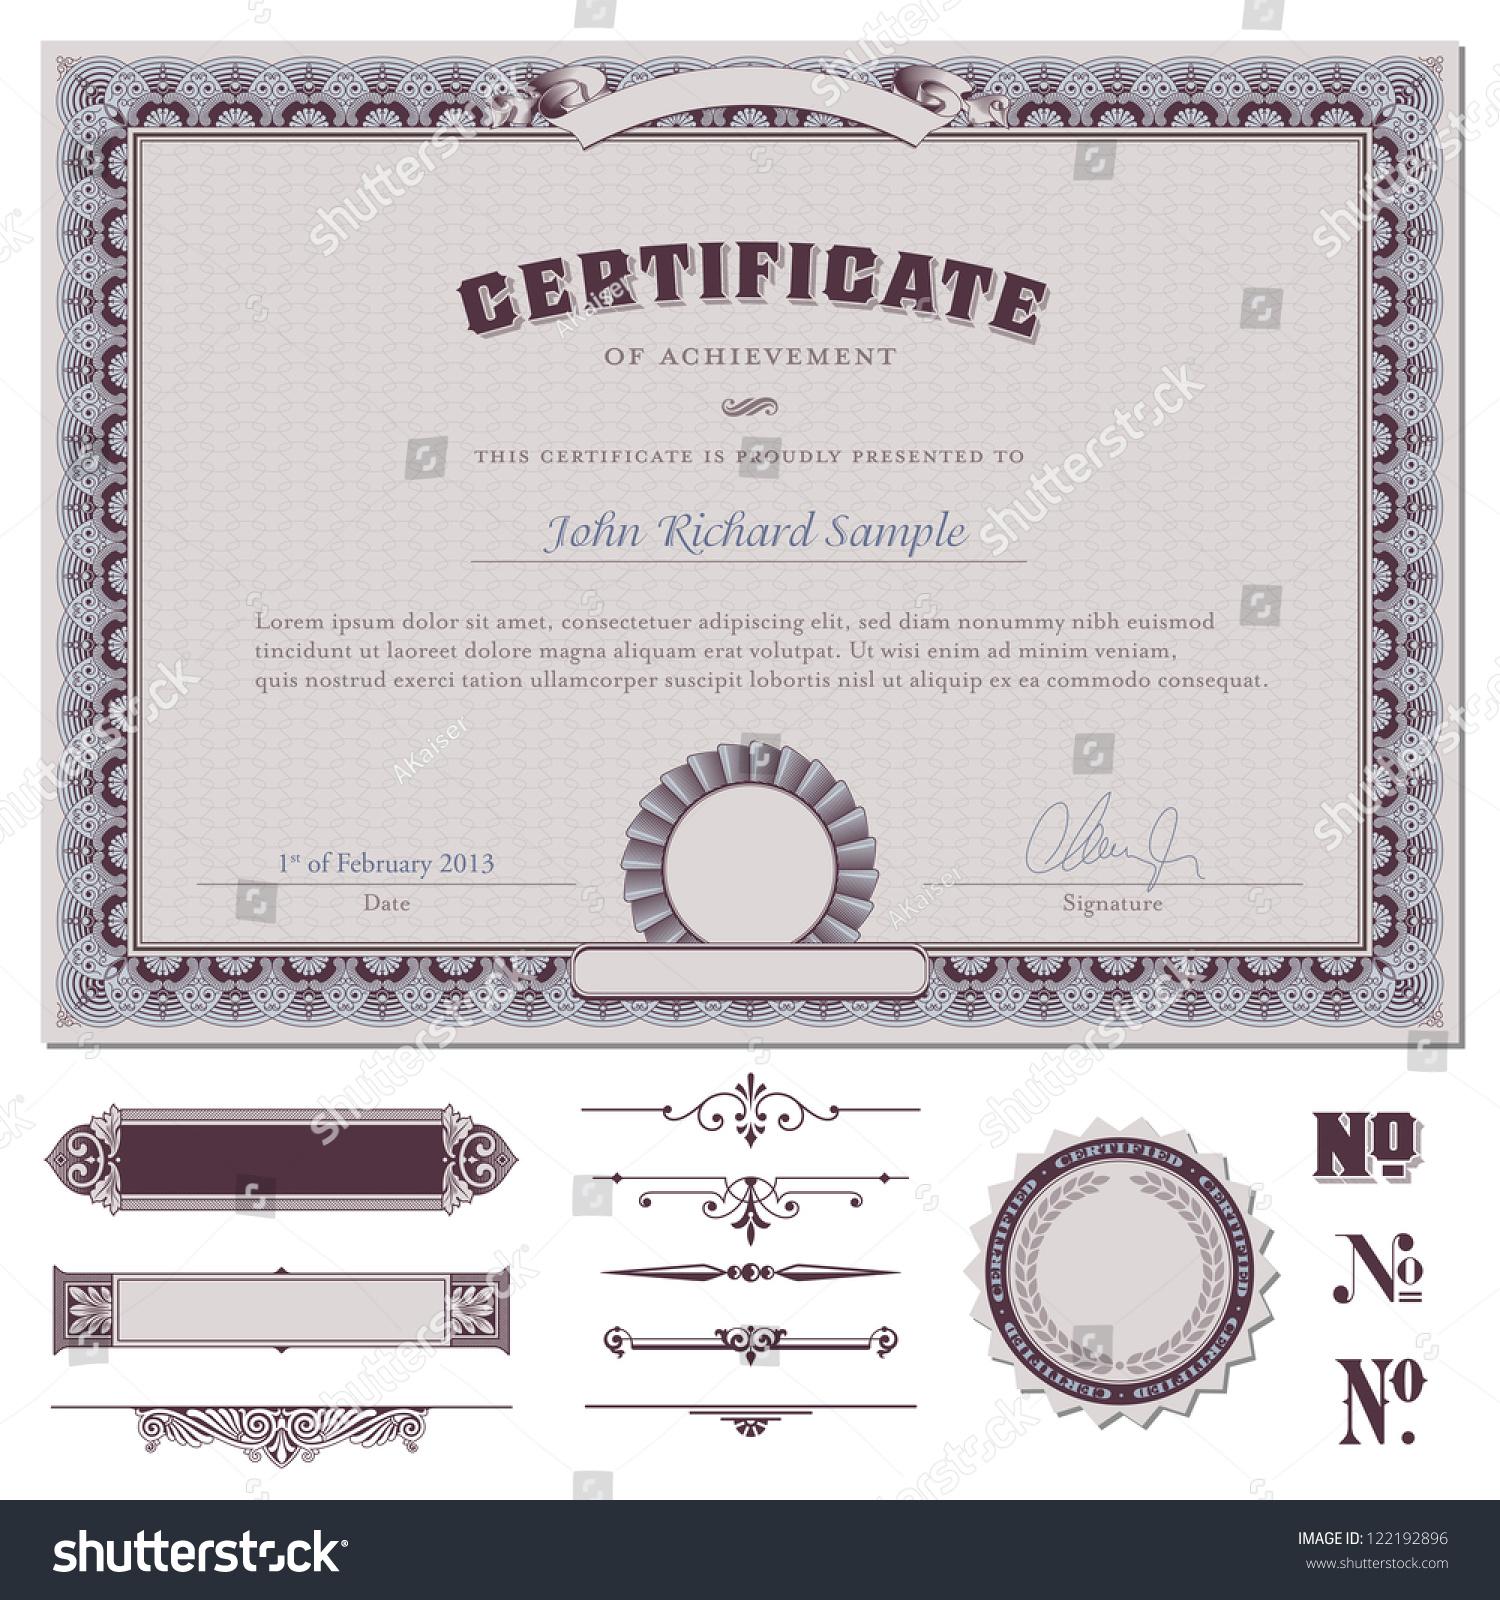 Certificate template additional design elements stock vector certificate template with additional design elements xflitez Images